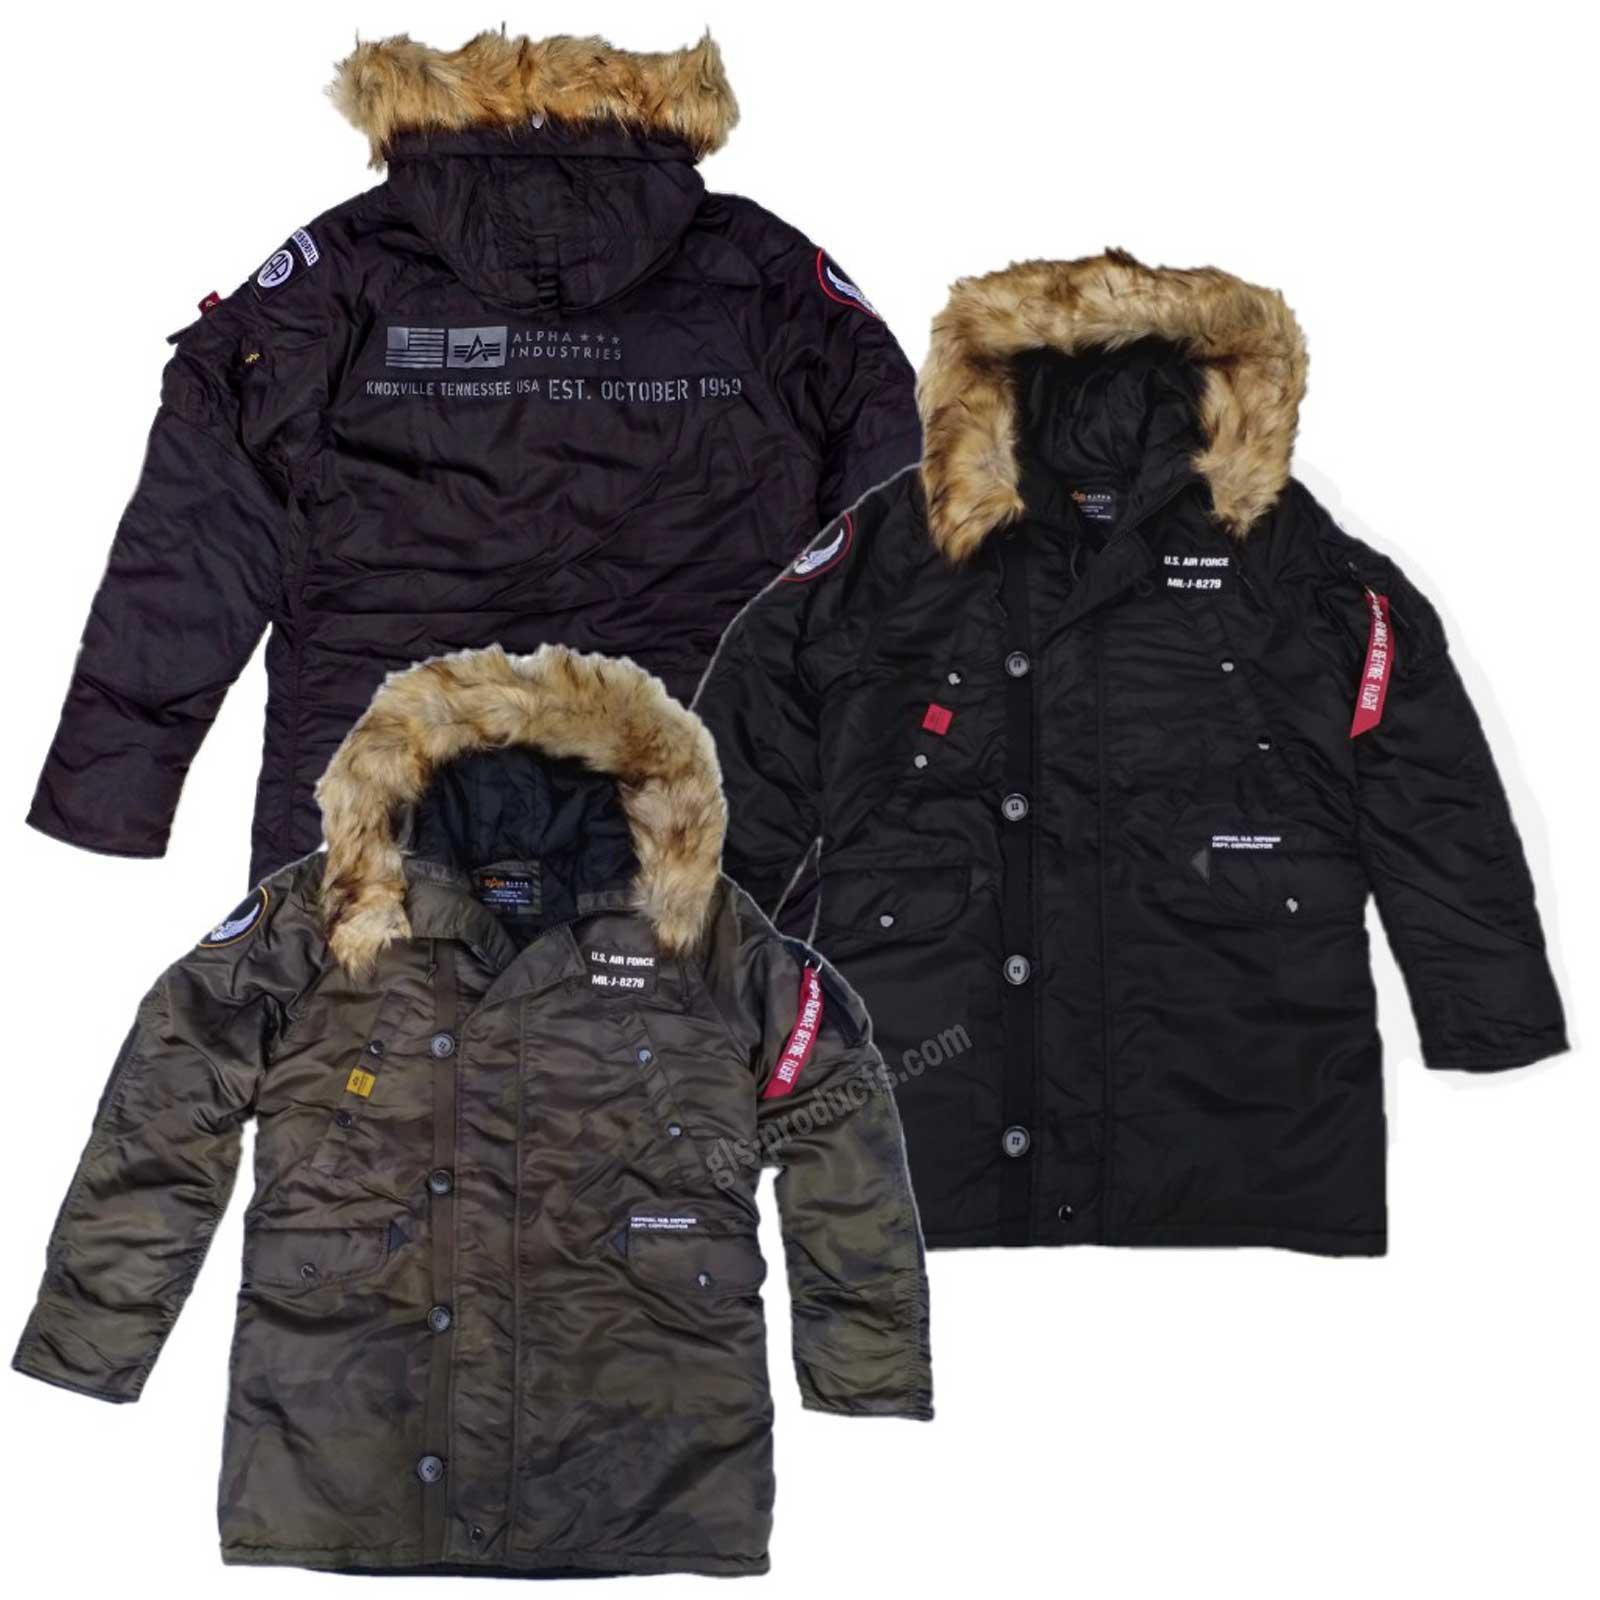 huge discount d92c3 ceaff Alpha Industries N3B Airborne 188141 Hip-length hooded jacket